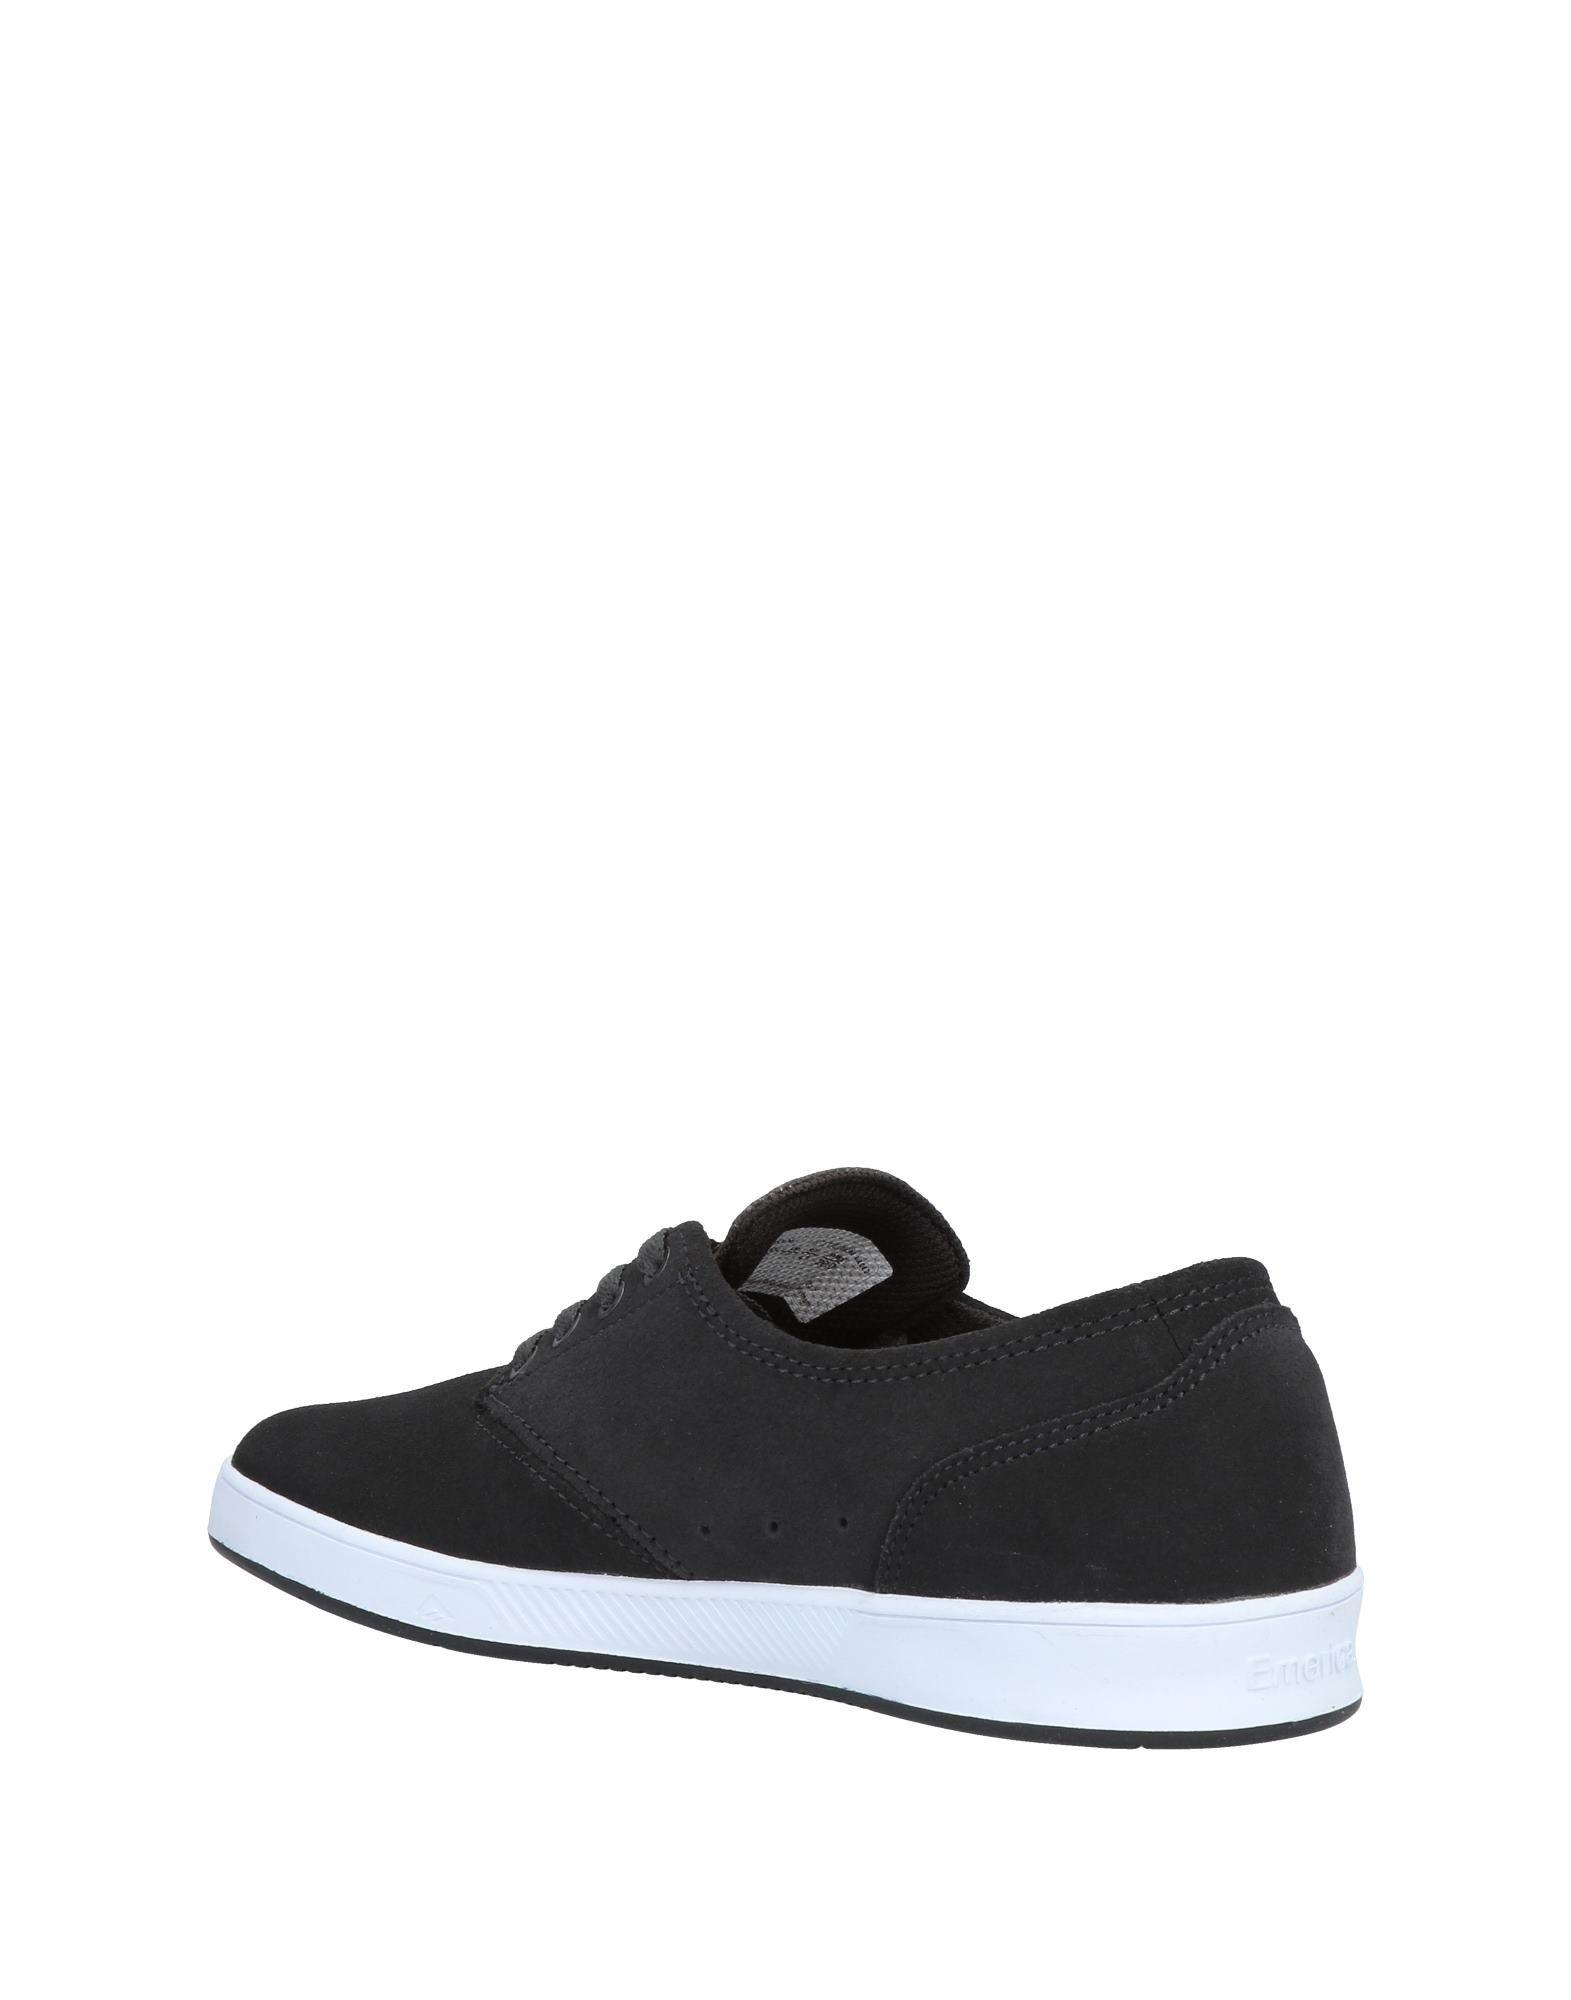 Moda Sneakers Emerica Uomo Uomo Emerica - 11476273FH aa8b97